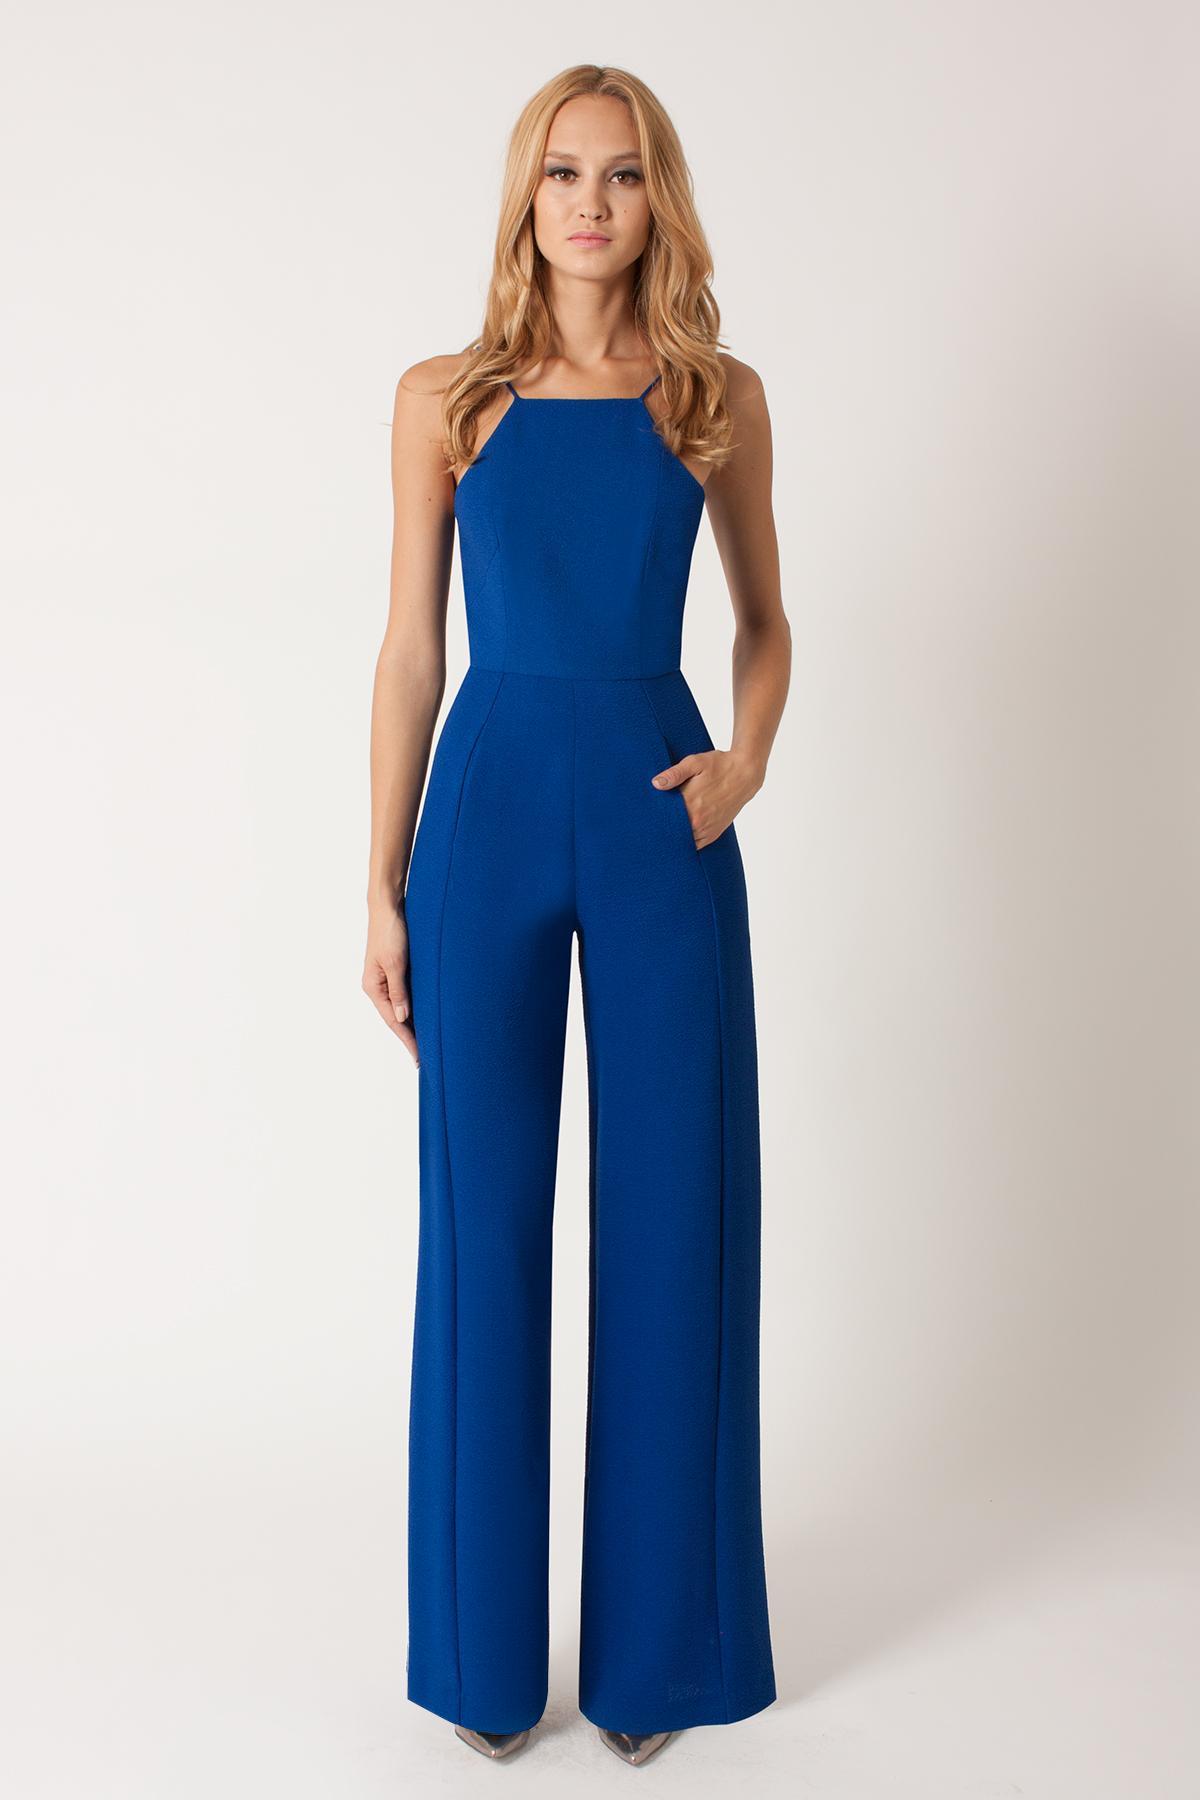 Wide Legged Jeans For Women